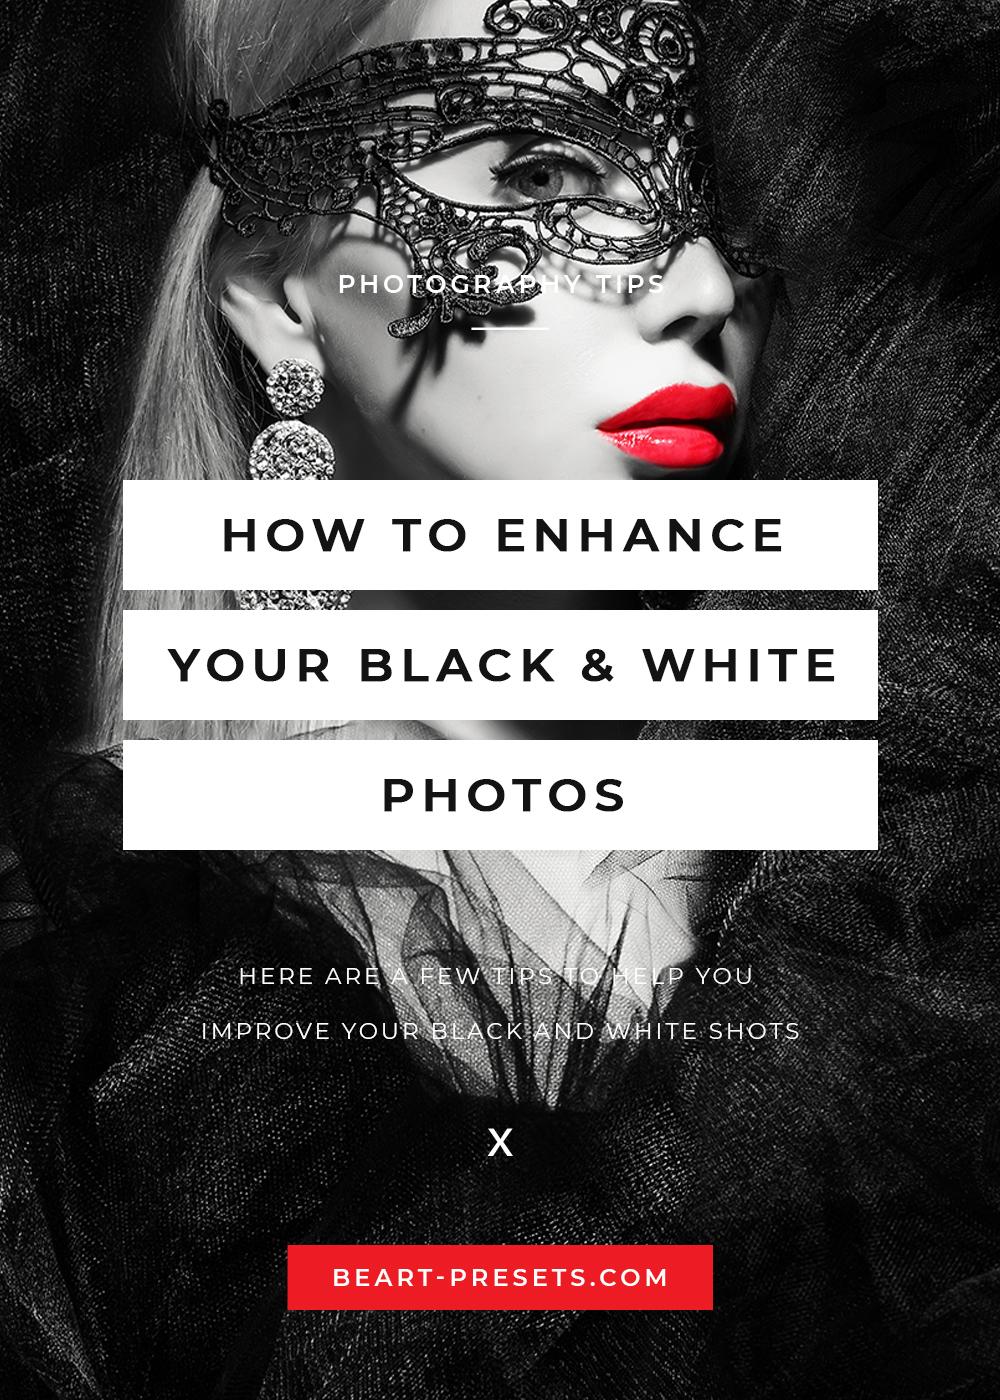 enhance BW photos